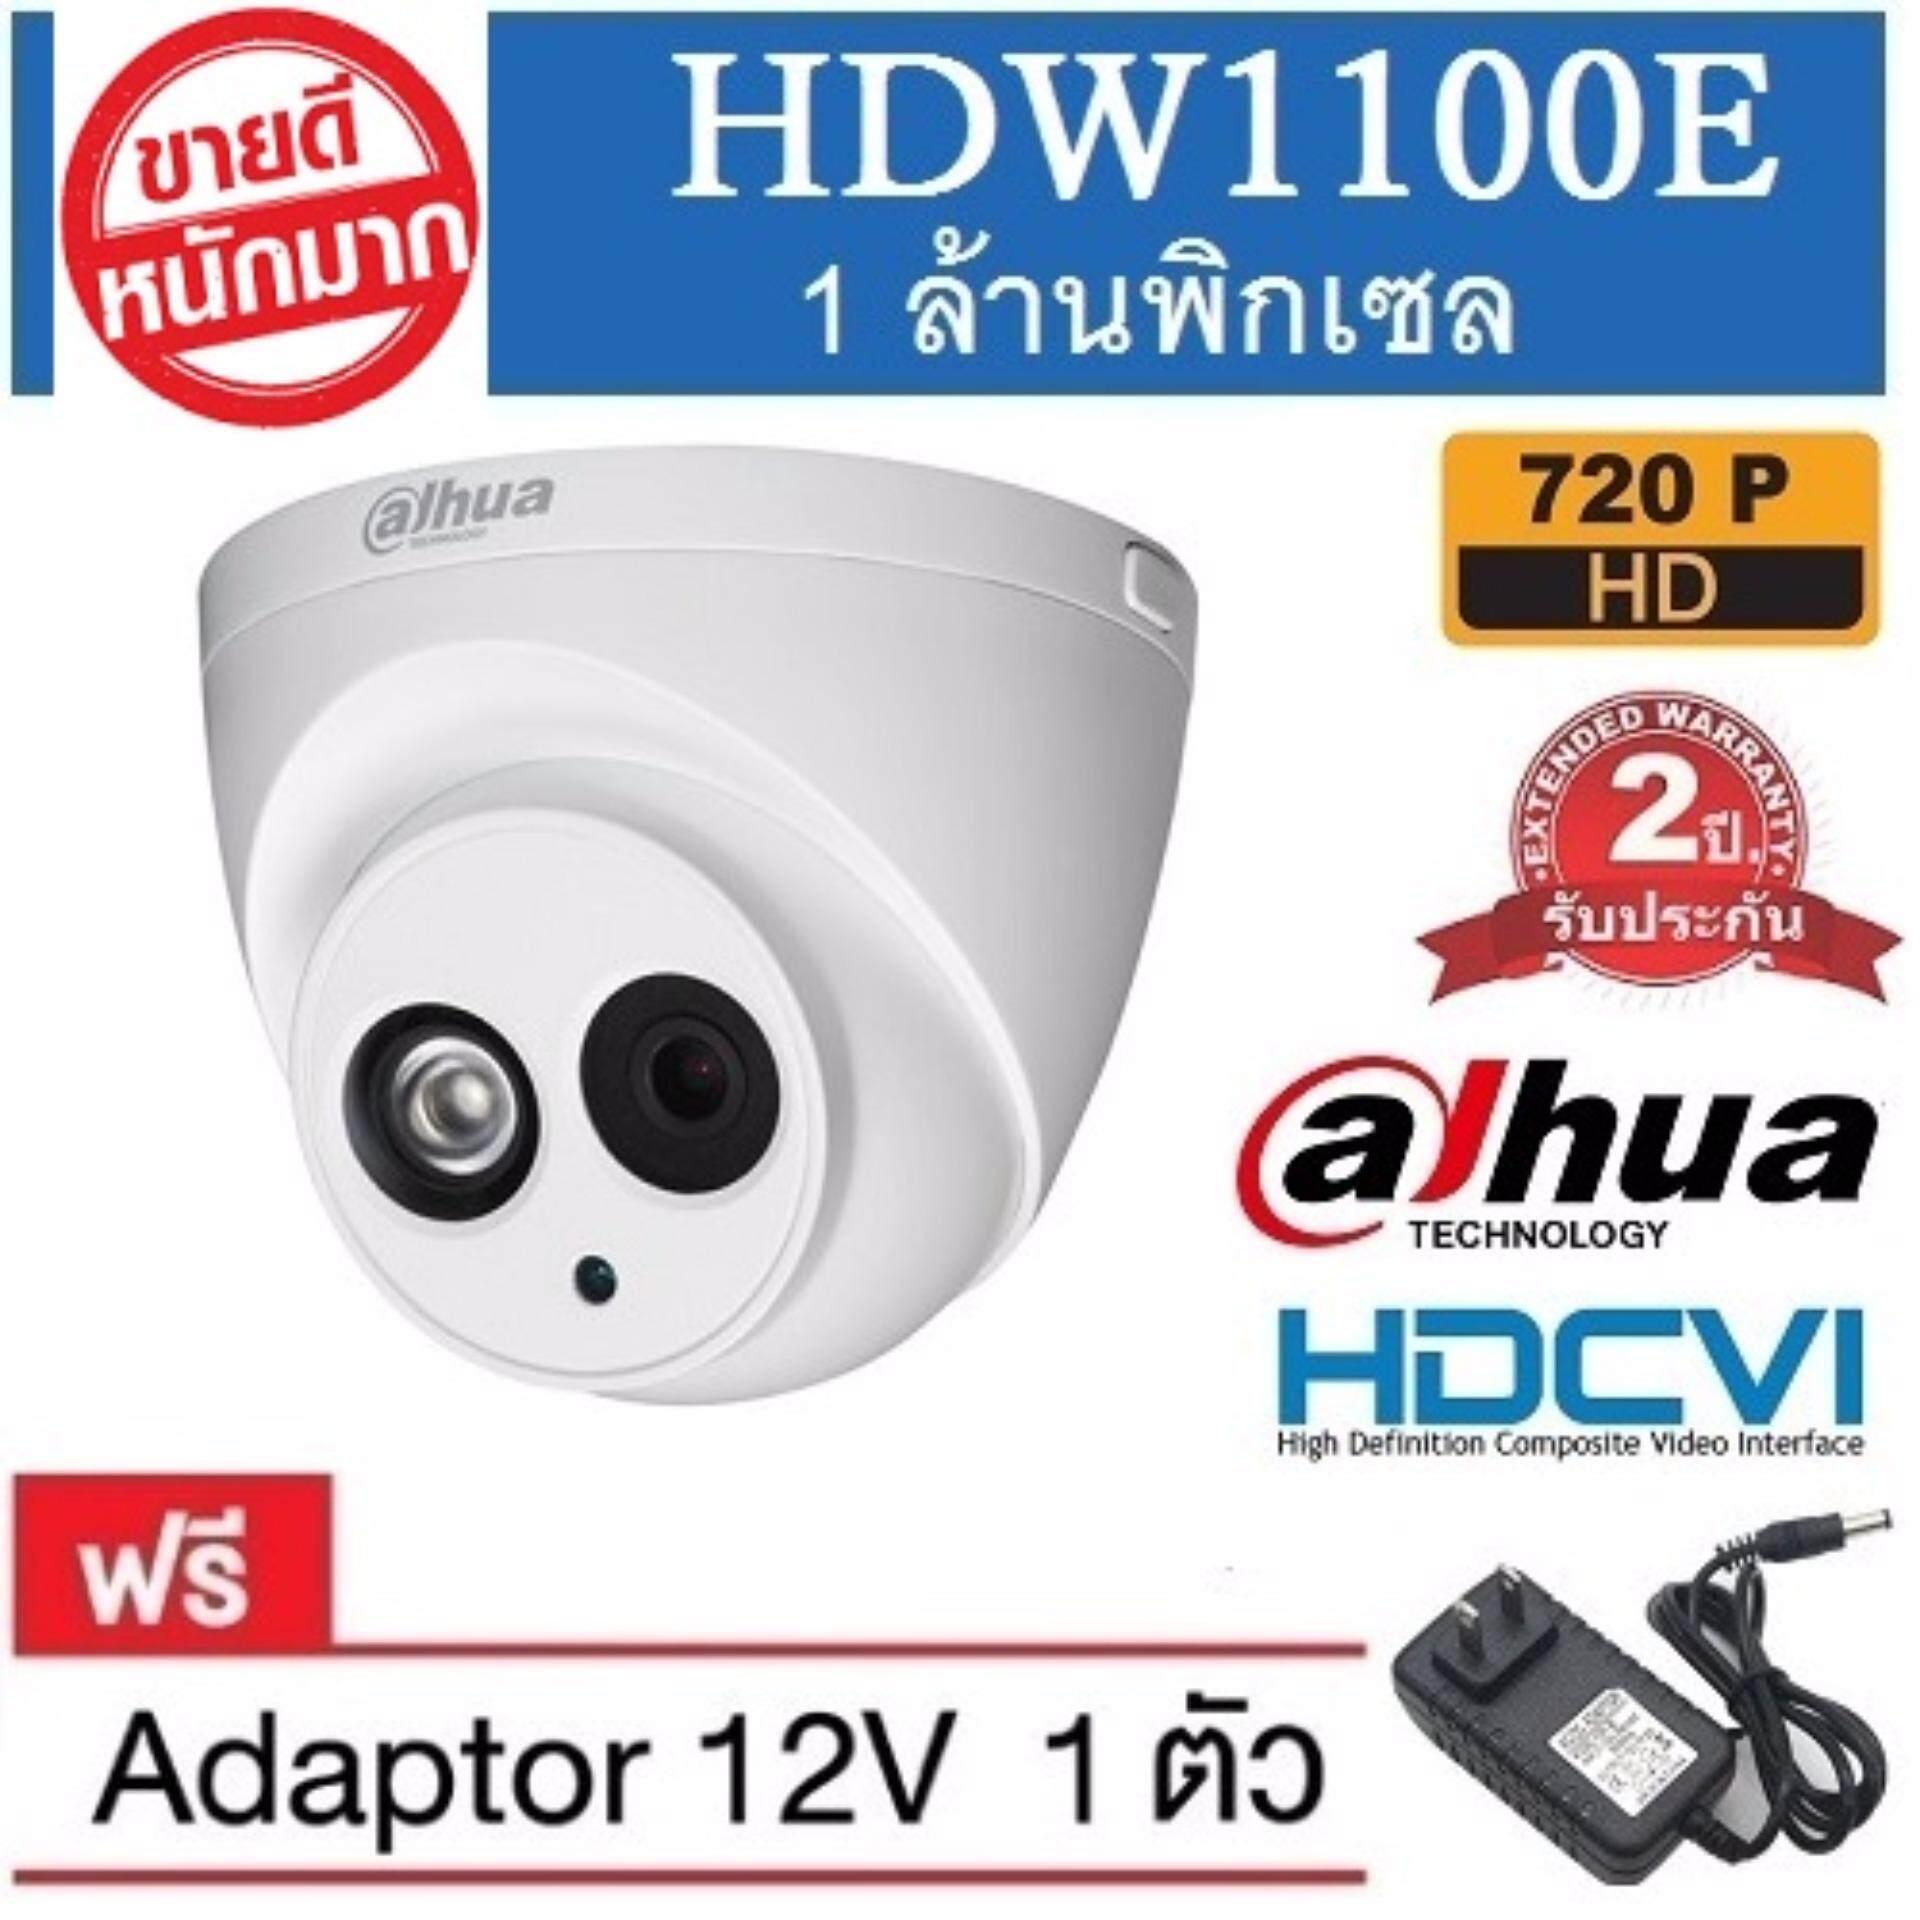 Dahua DH-HAC-HDW1100E 1Megapixel 720P IR HDCVI Dome Camera